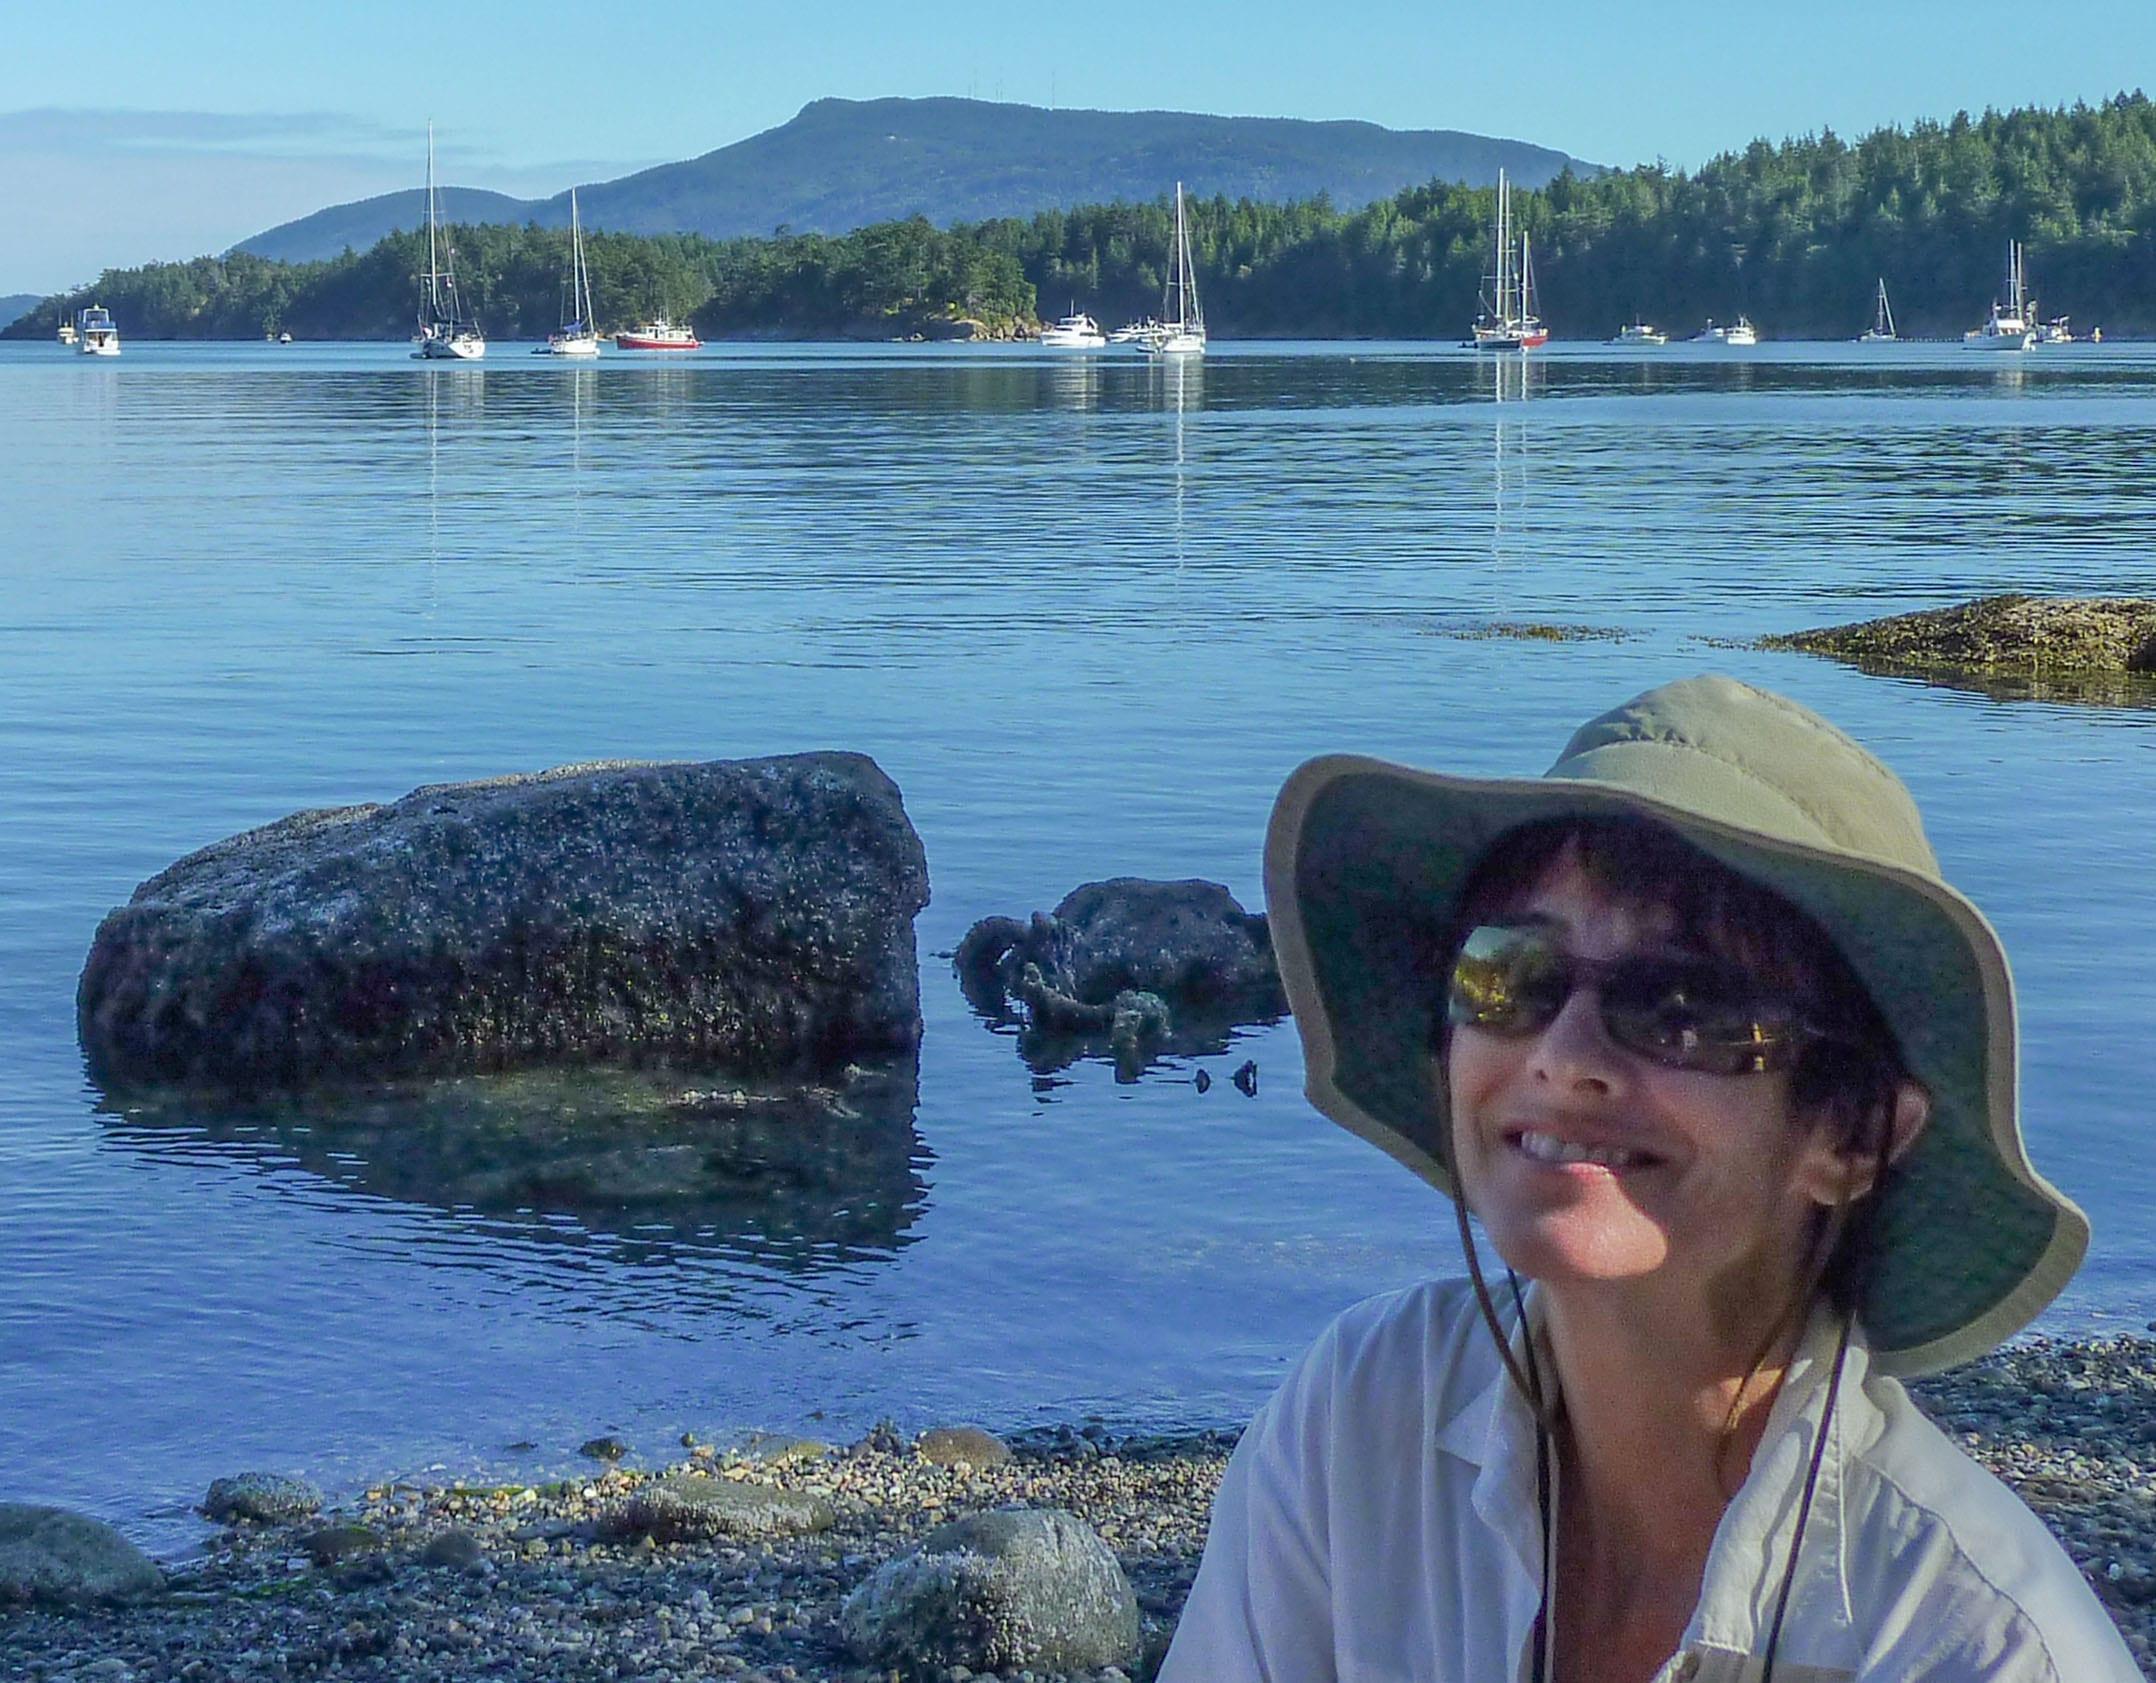 Sandi Friel at Sucia Island